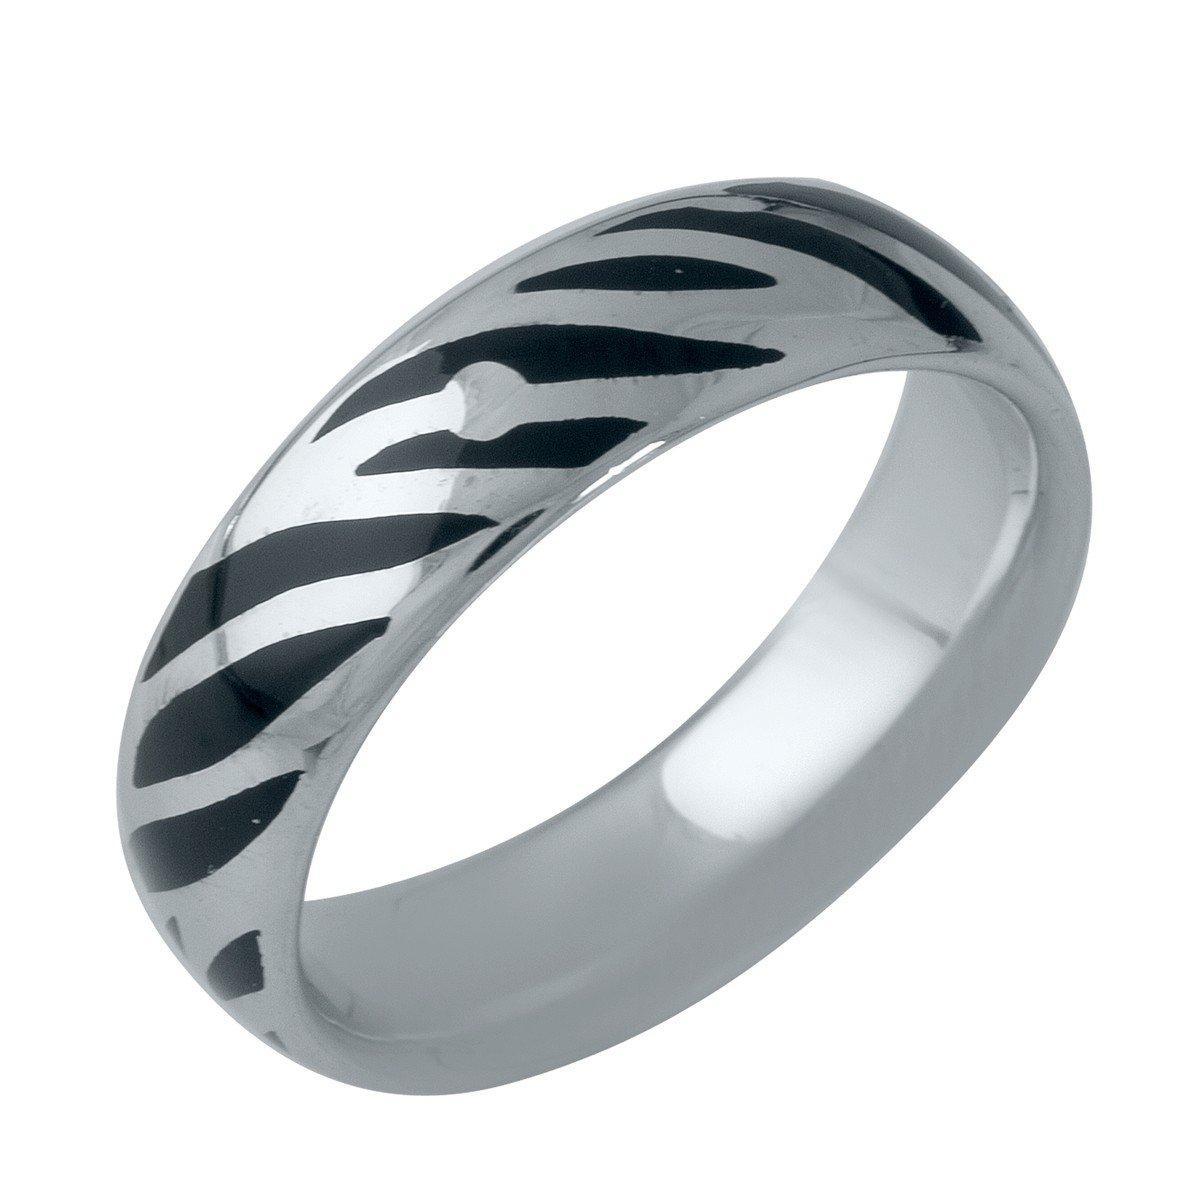 Серебряное кольцо DreamJewelry с емаллю (1985946) 16.5 размер